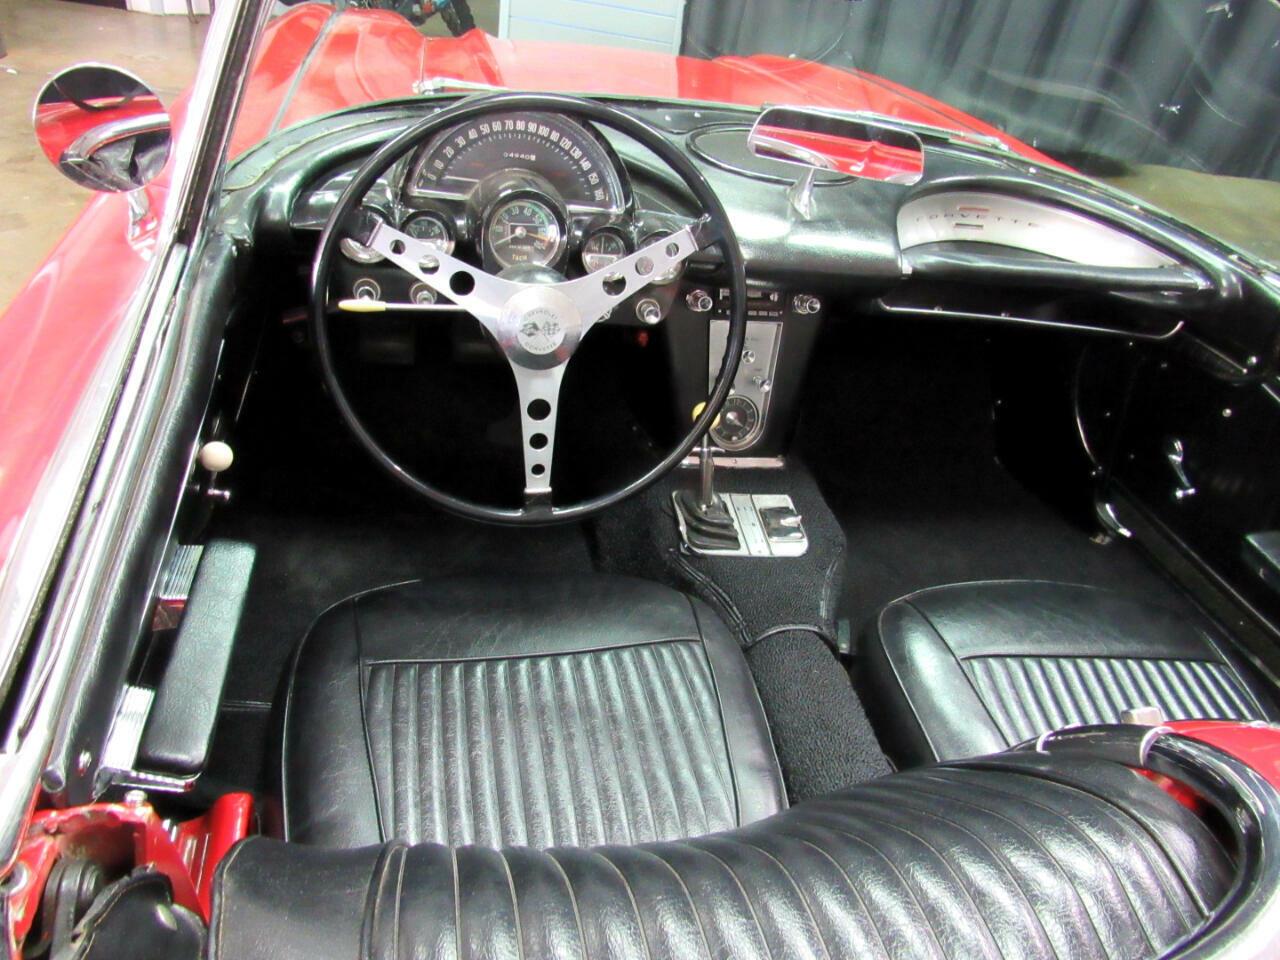 1962 Red Chevrolet Corvette Convertible    C1 Corvette Photo 9